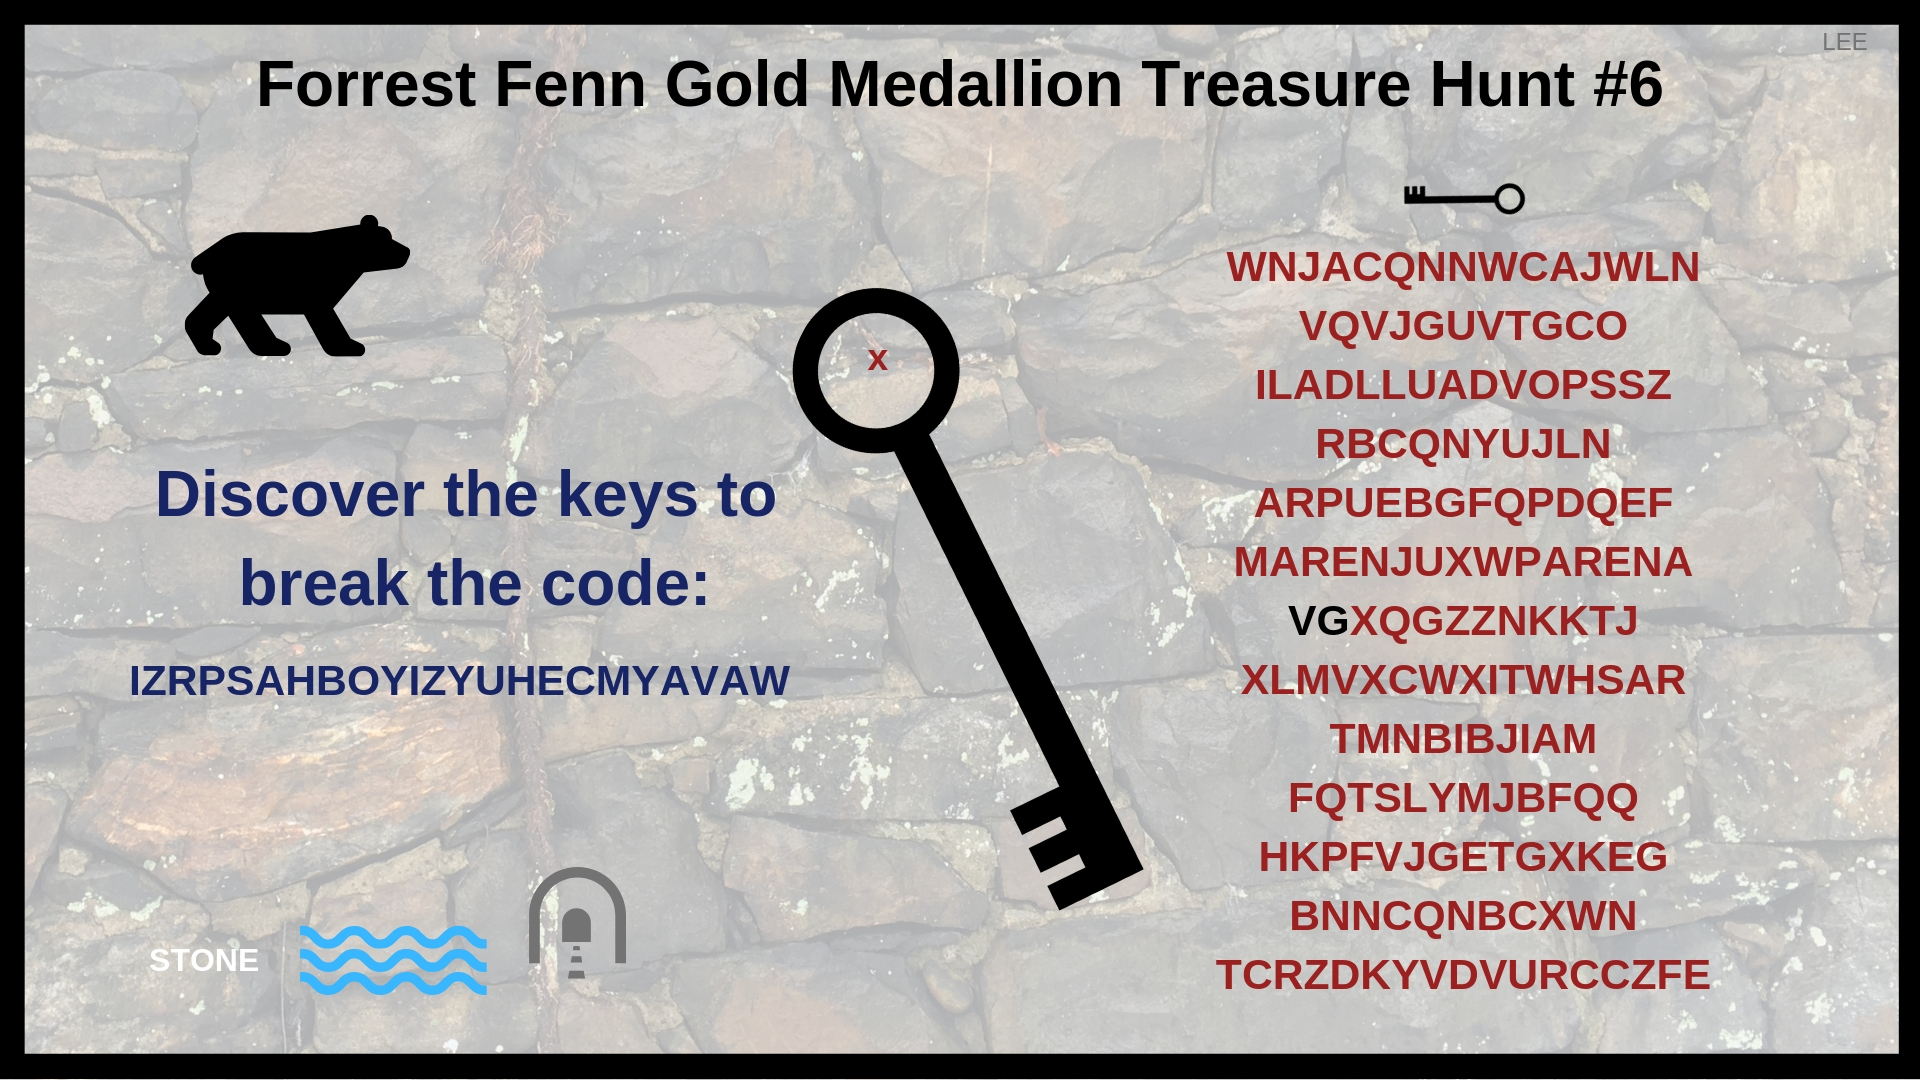 Forrest Fenn Gold Medallion Treasure Hunt #6 Clues